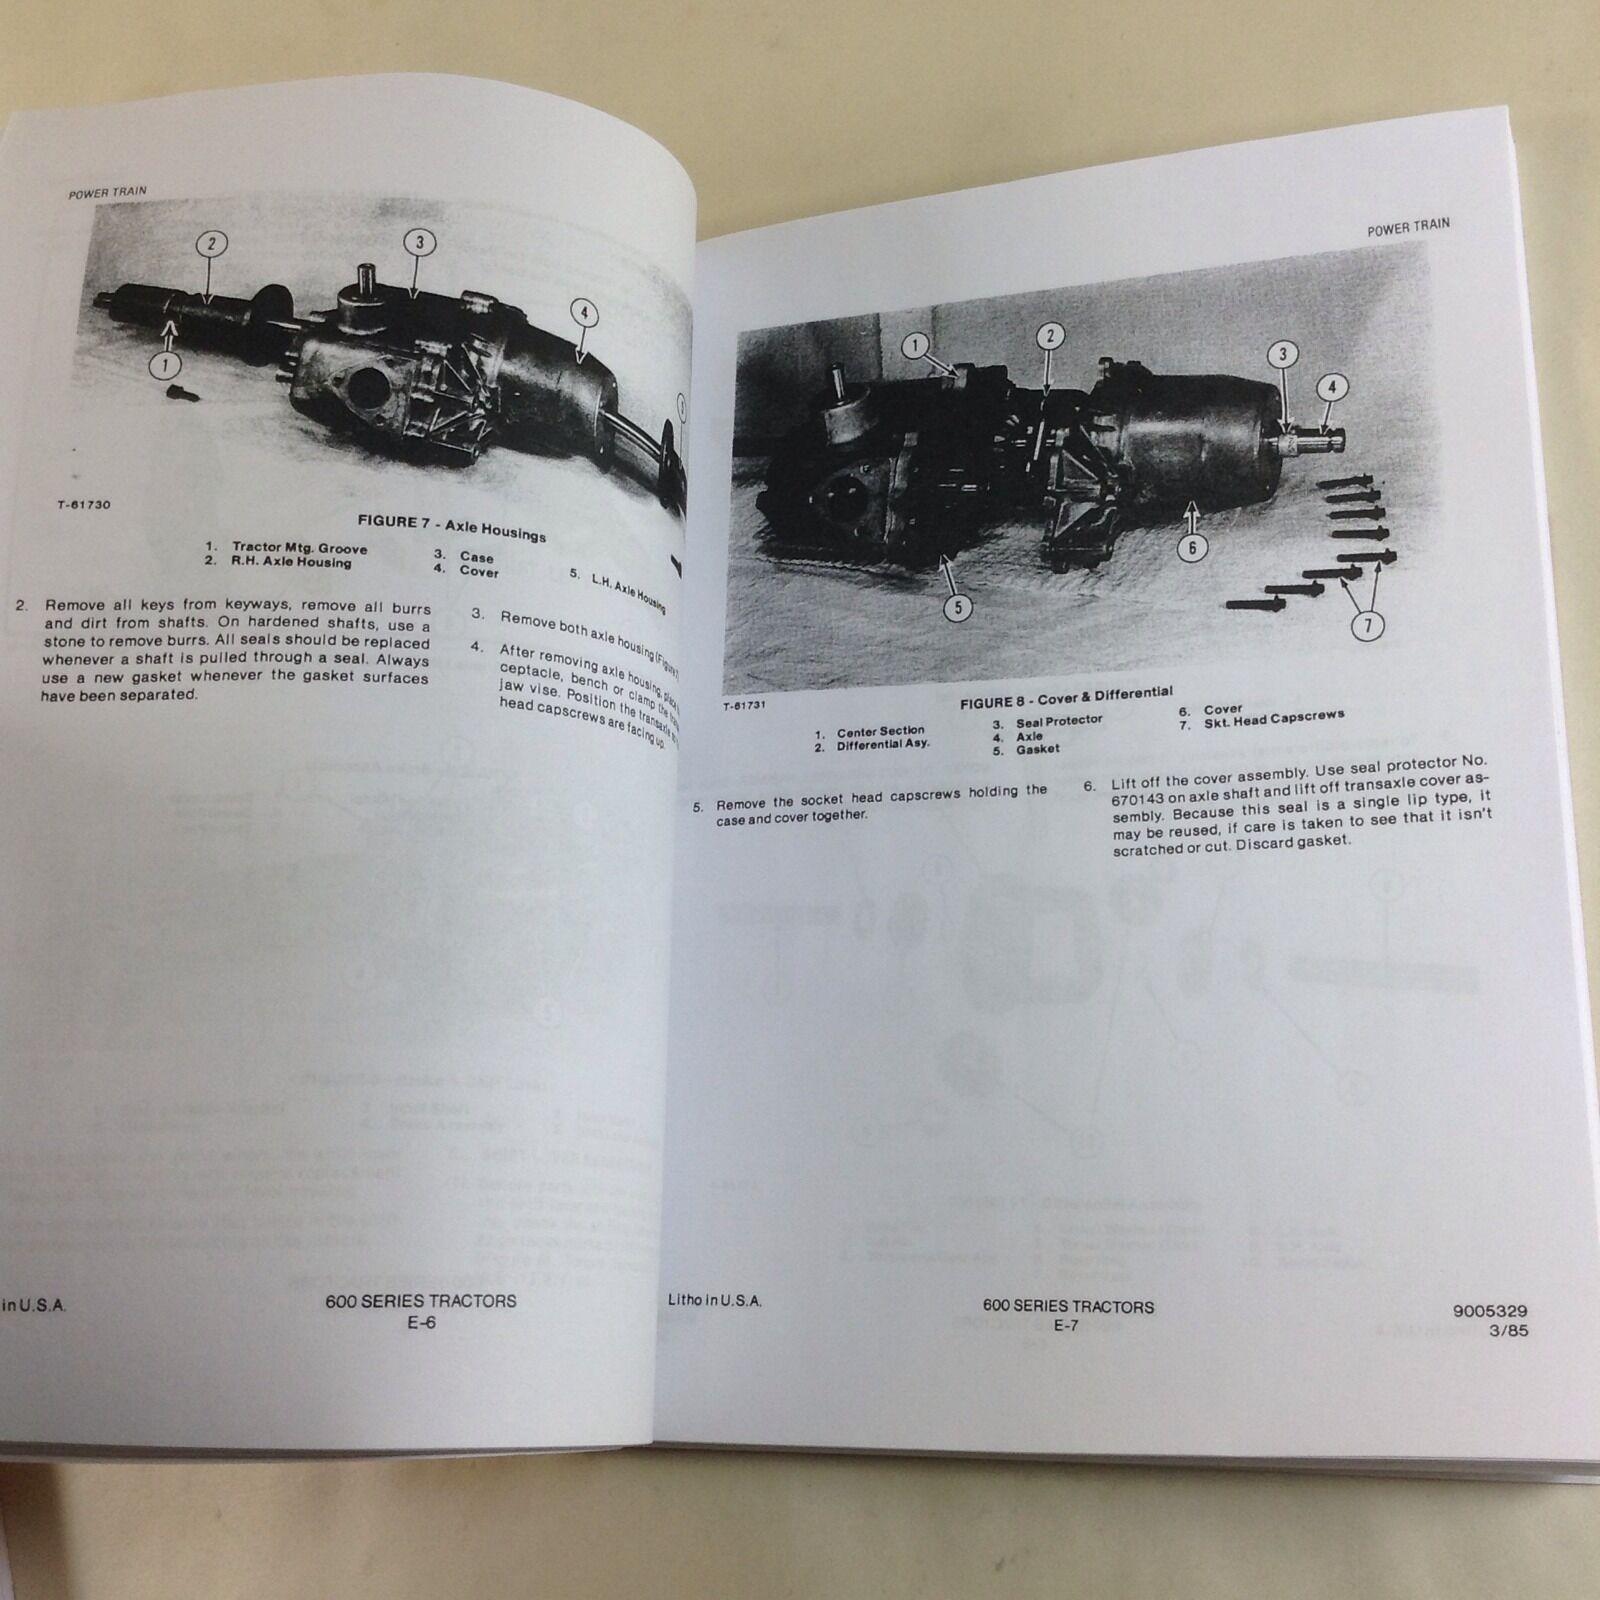 611 Allis Chalmers Wiring Schematic Diagrams Lawn Mower Diagram 611h H Series Tractor Garden Service Simplicity